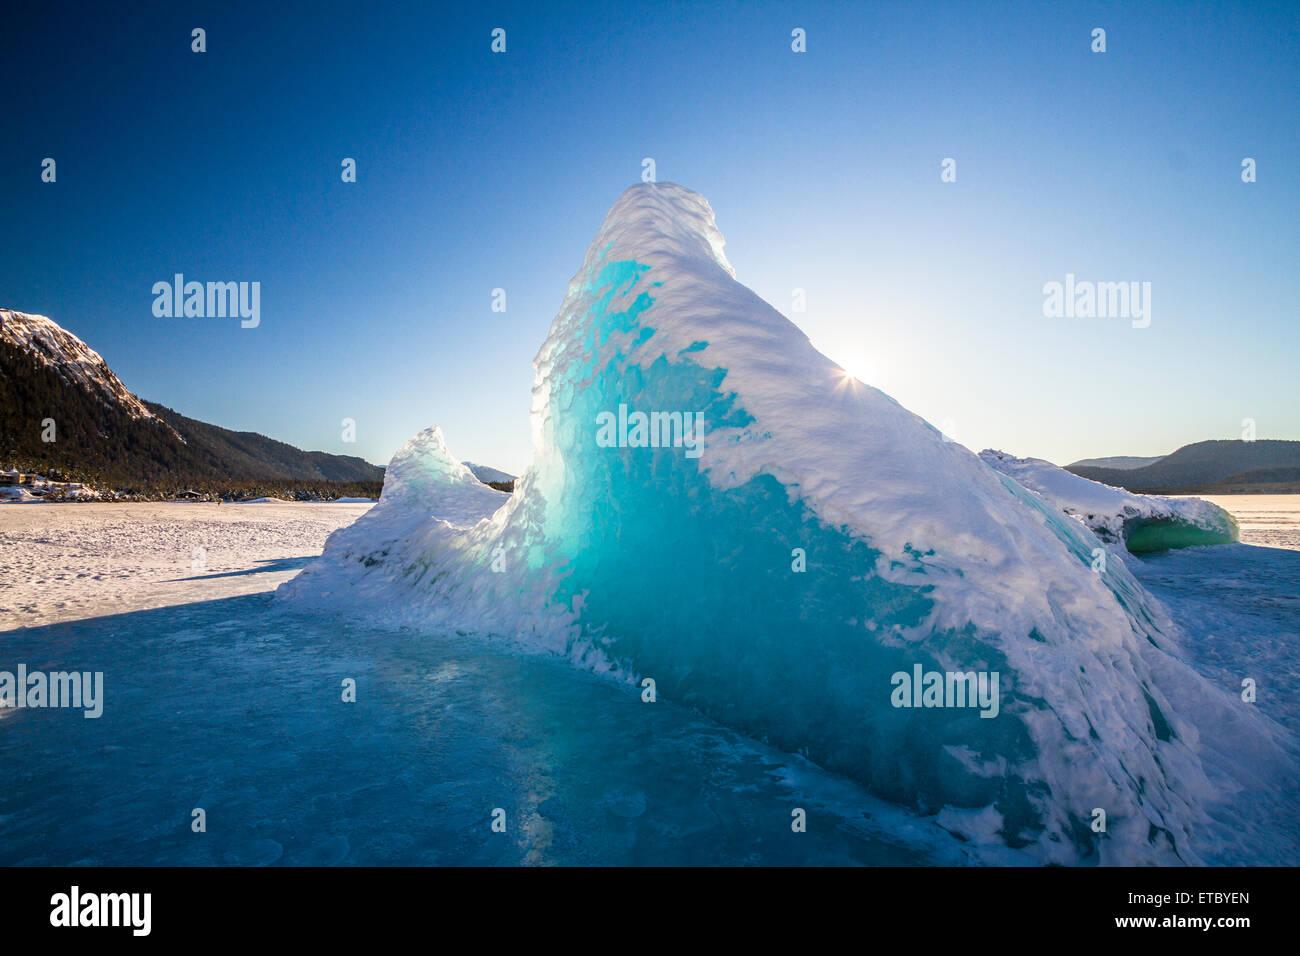 The sun shines through an iceberg on Juneau's frozen Mendenhall glacier, Alaska - Stock Image